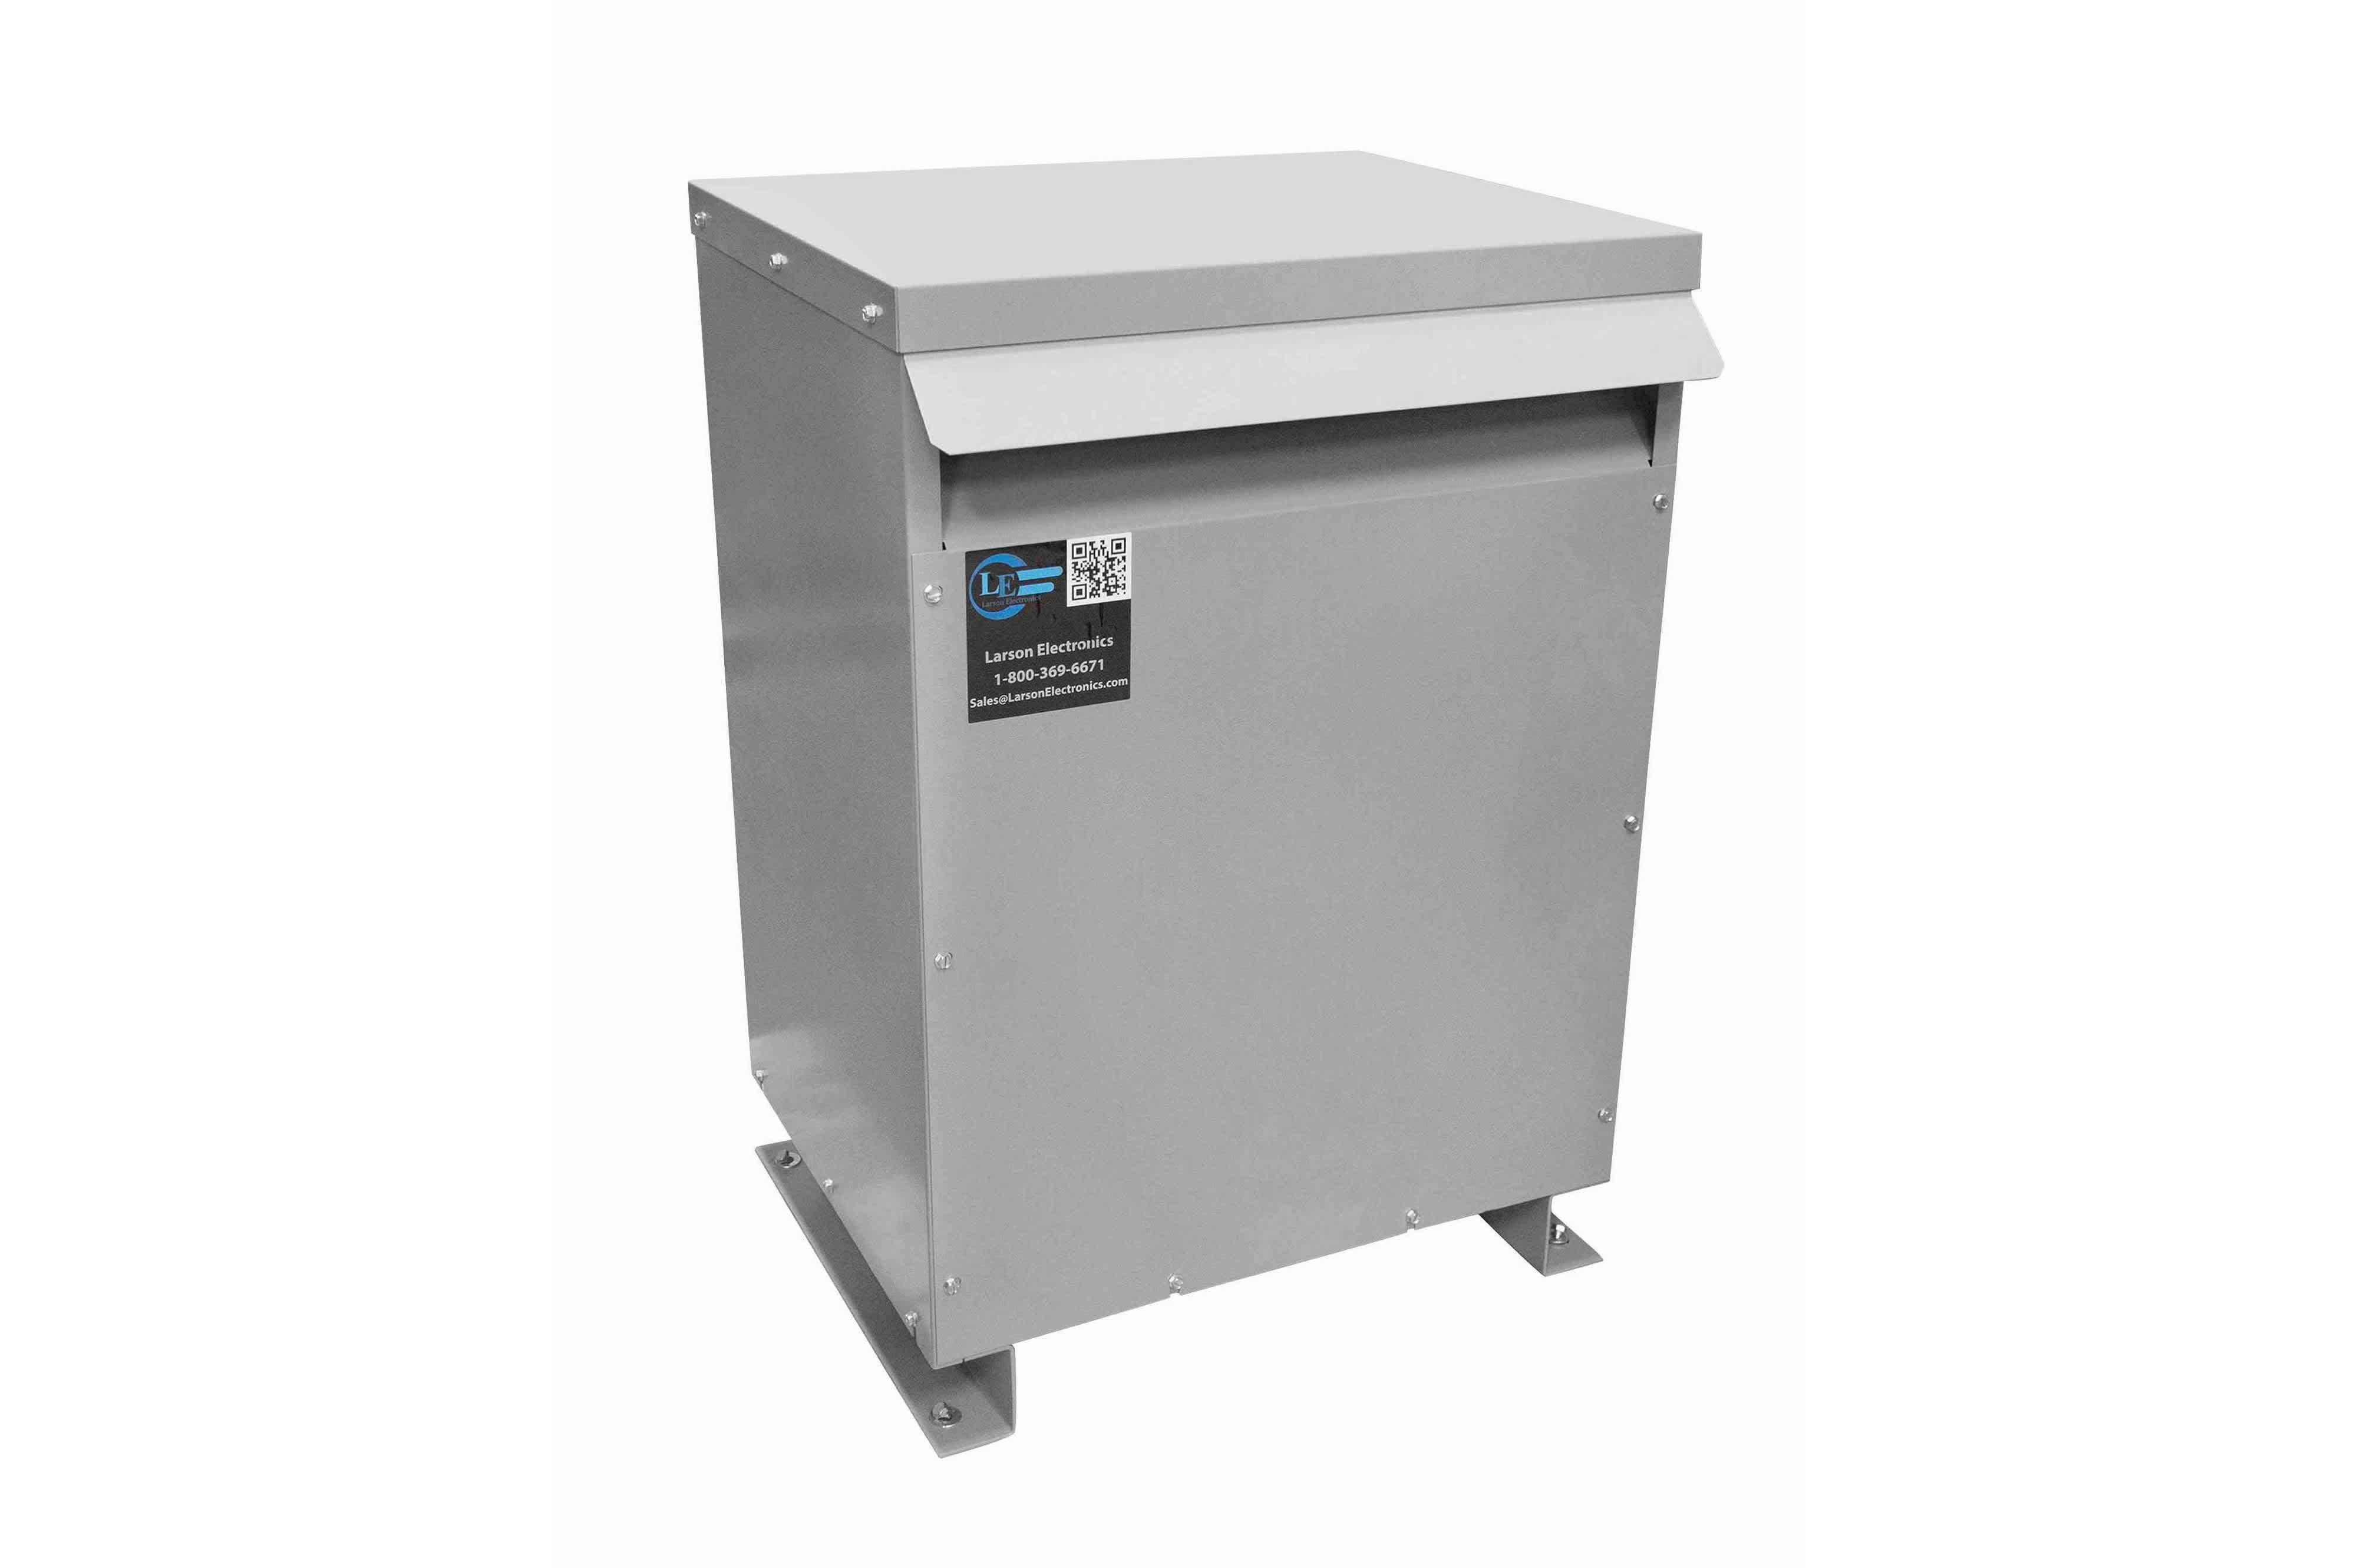 750 kVA 3PH Isolation Transformer, 460V Wye Primary, 600V Delta Secondary, N3R, Ventilated, 60 Hz